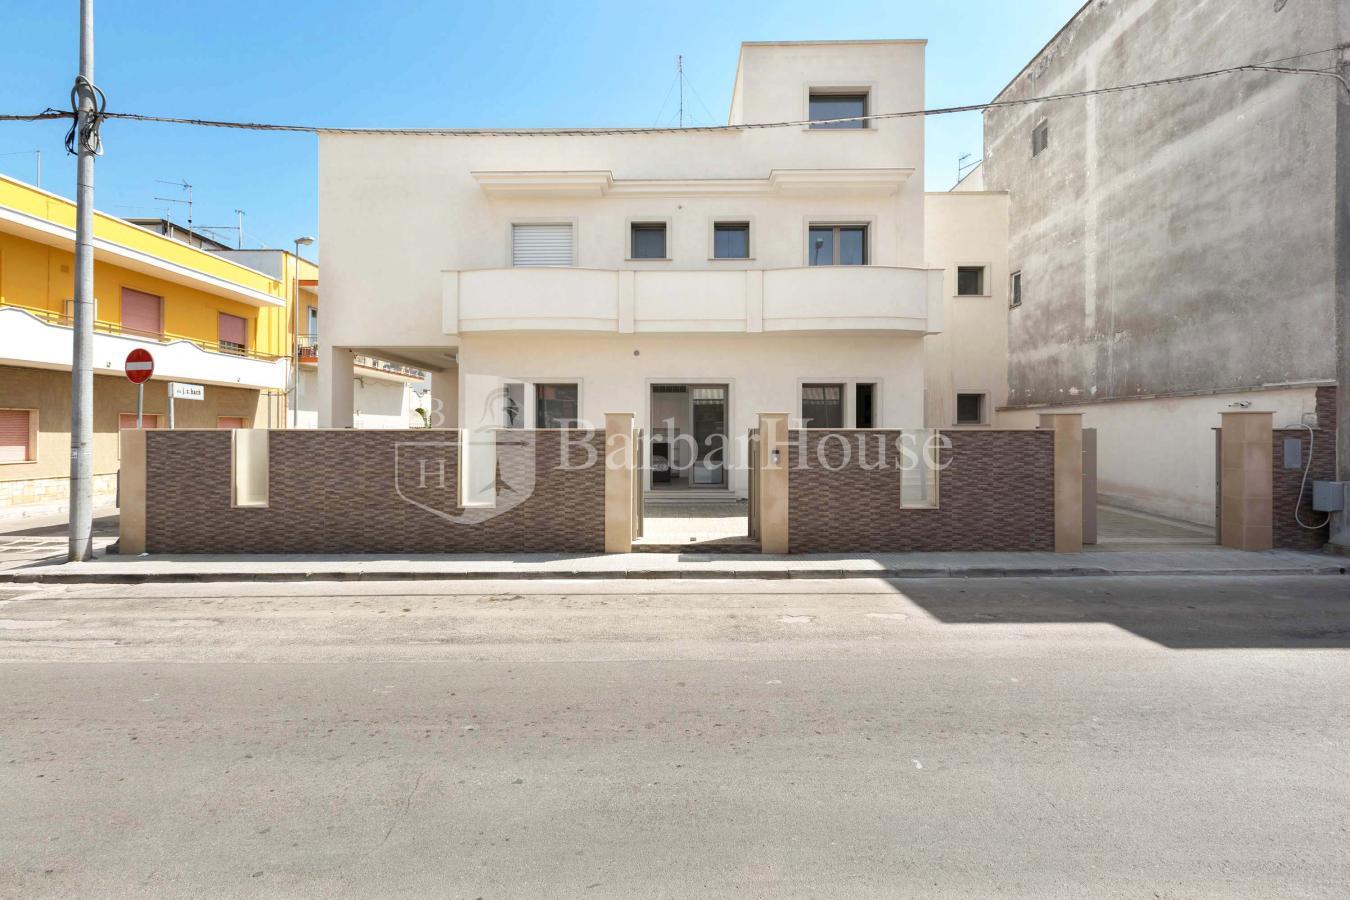 Ferienhauser - Porto Cesareo - Villino Blu Suite